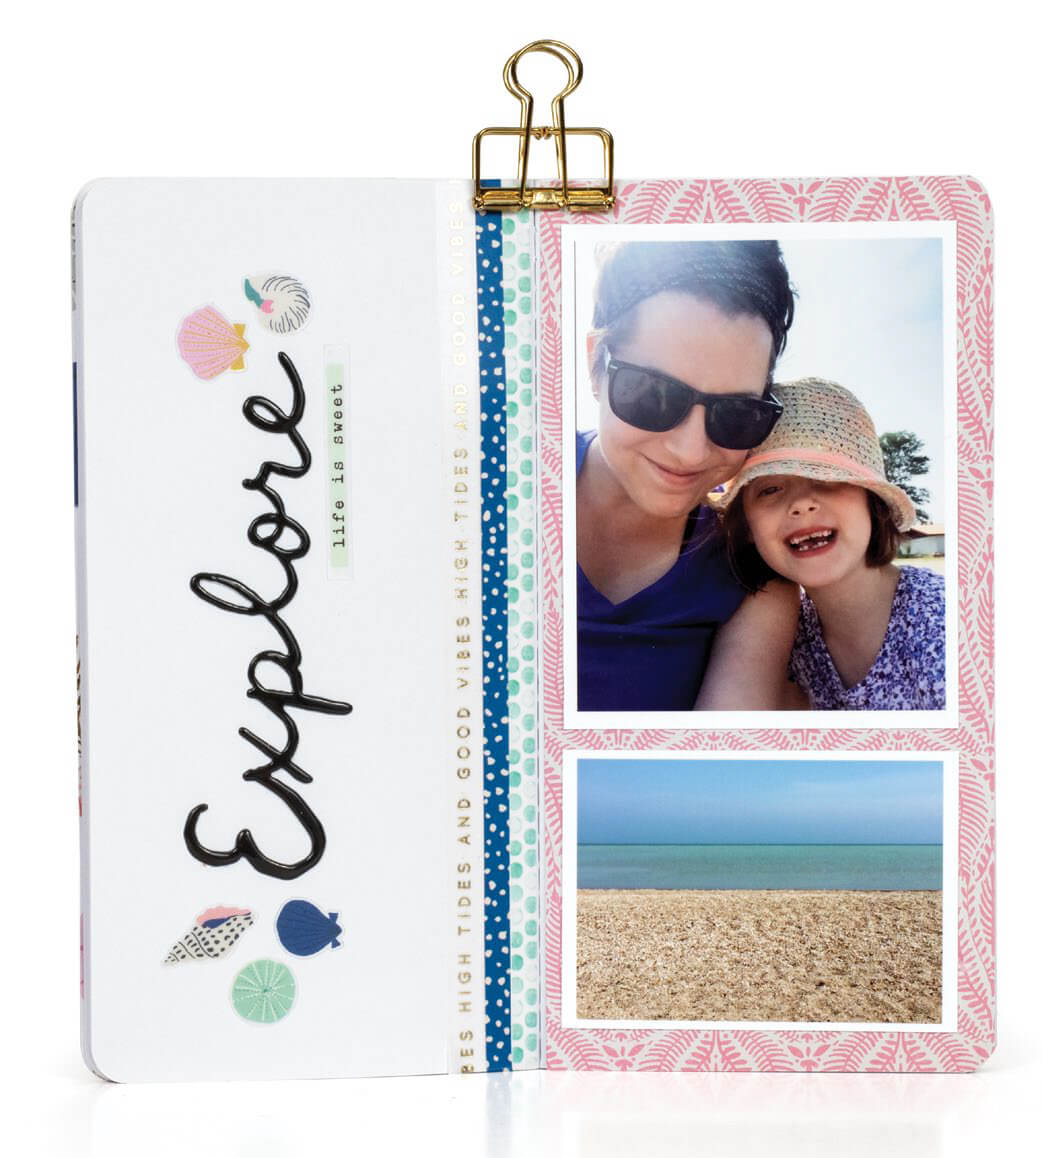 Scrapbook & Cards Today - Summer 2019 - Summertime Love Traveller's Notebook by Jess Forster